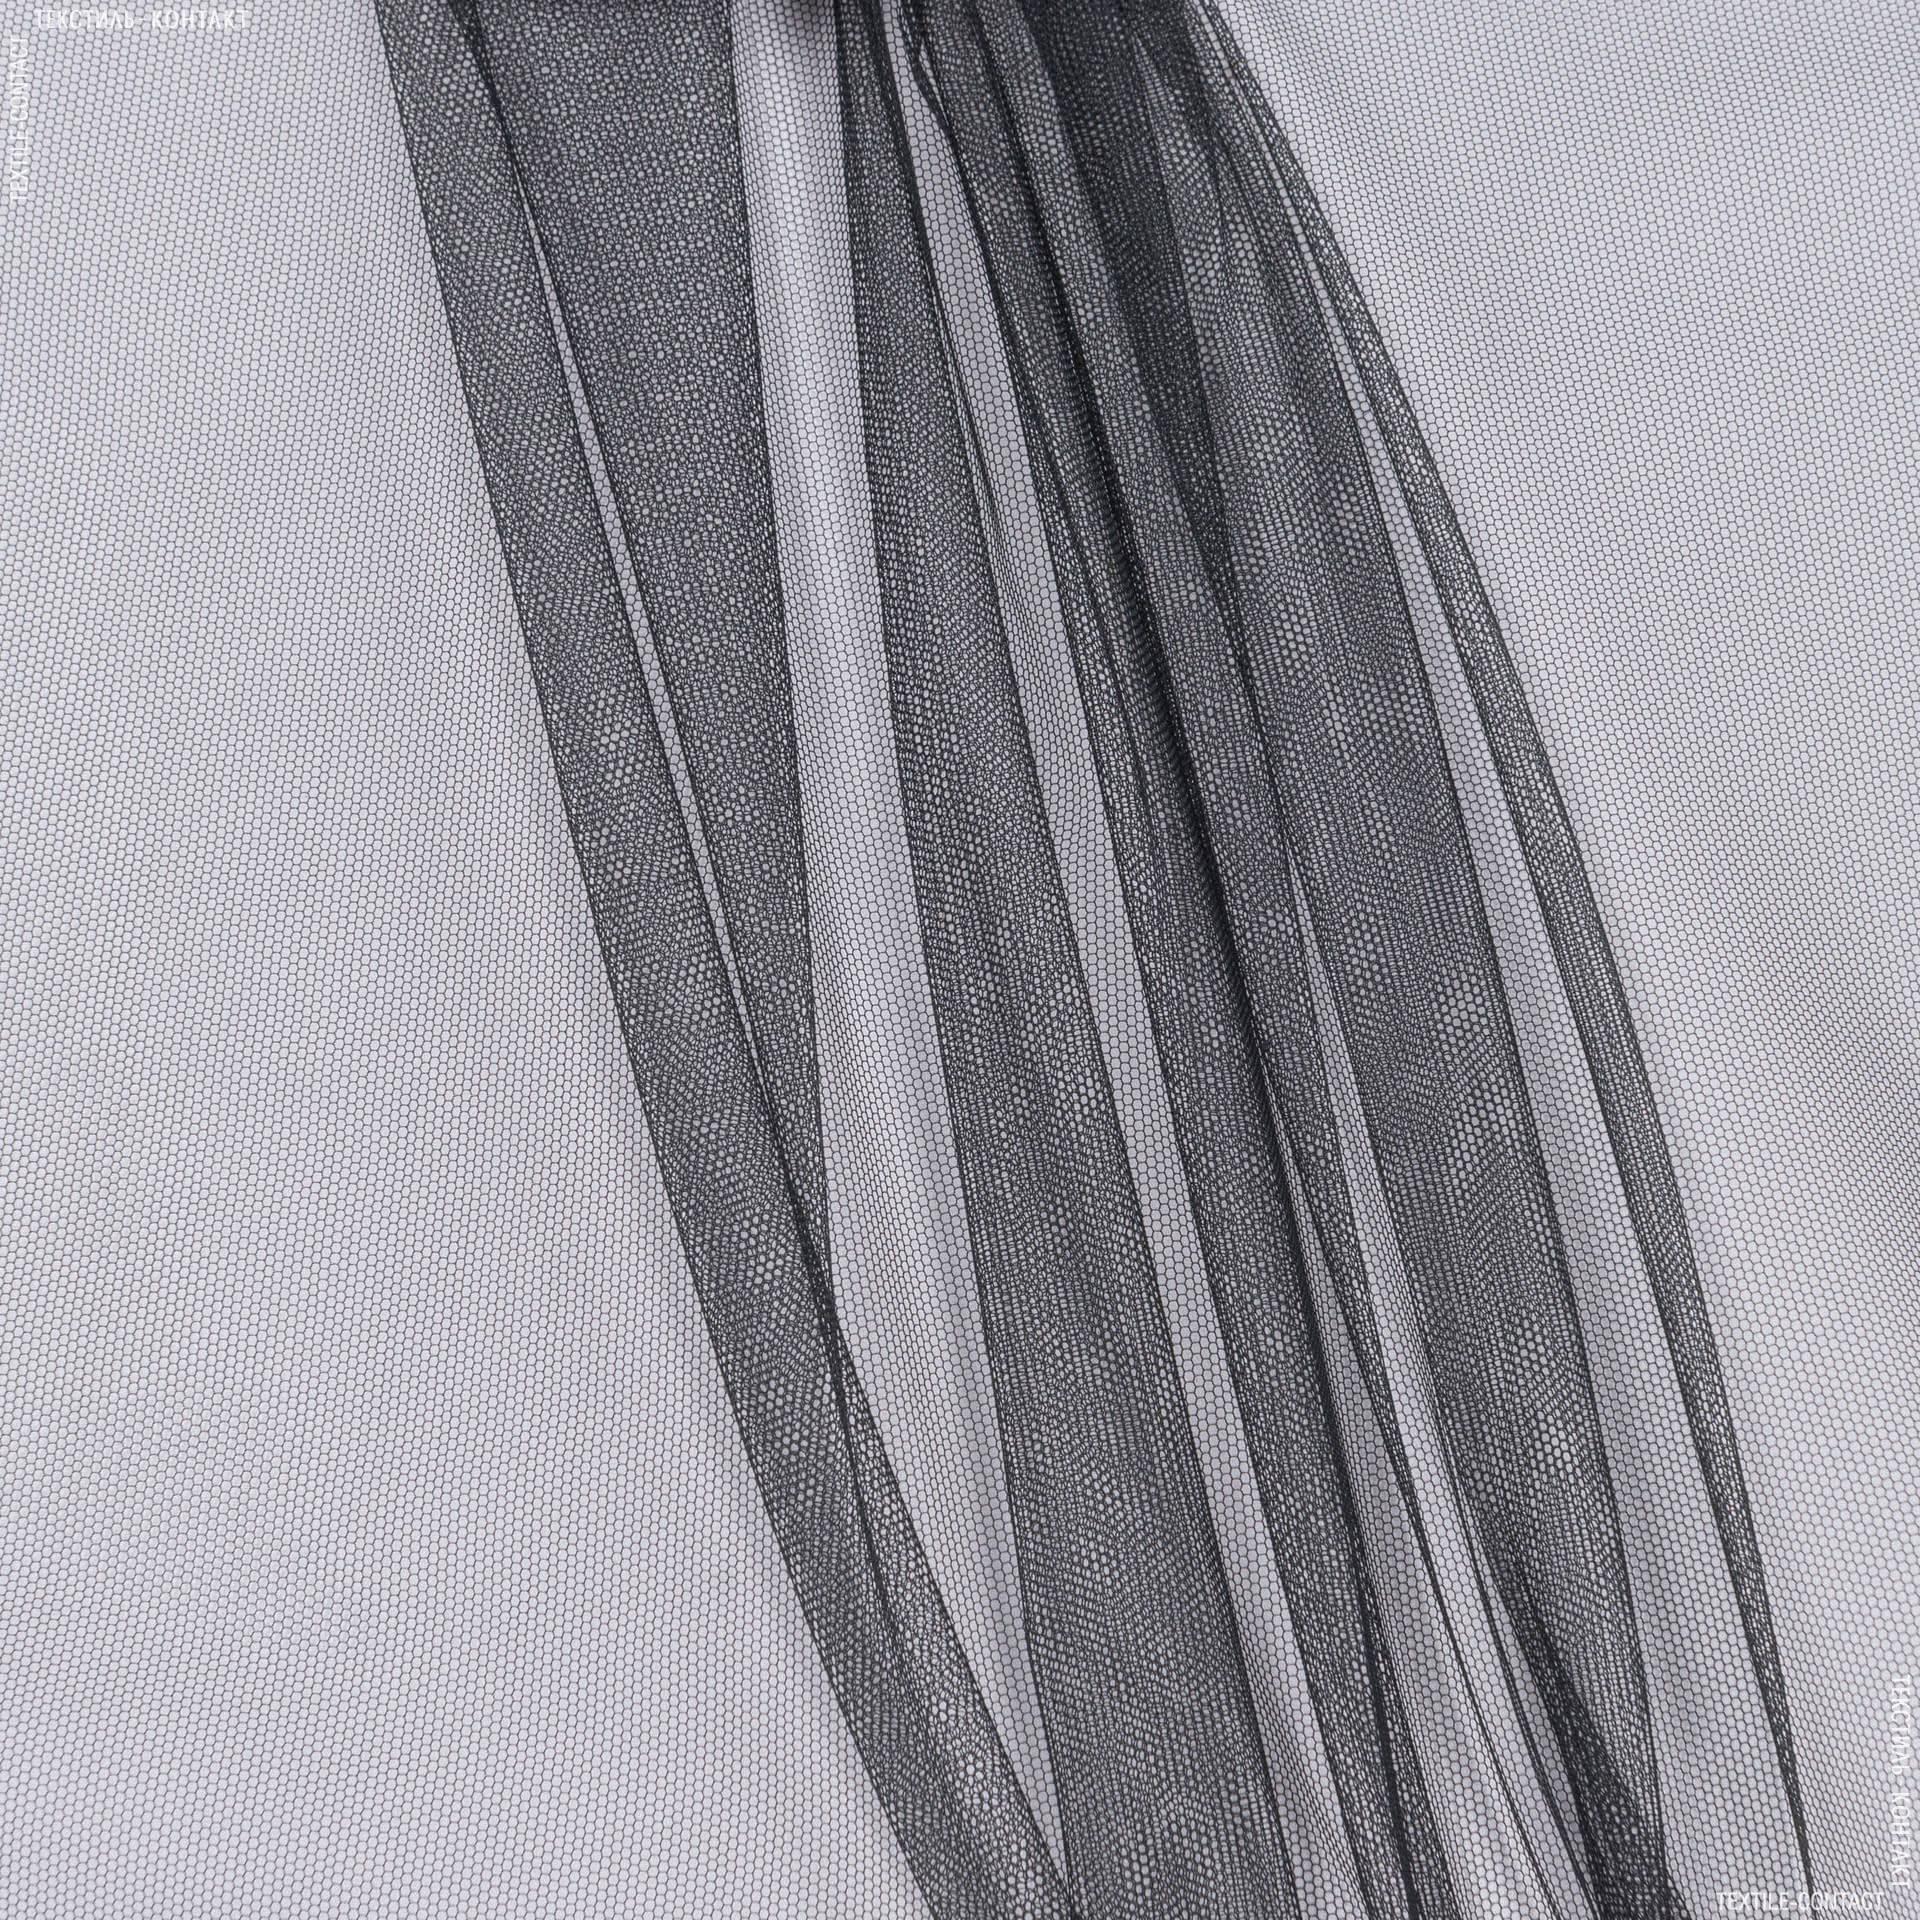 Тканини для суконь - Фатин